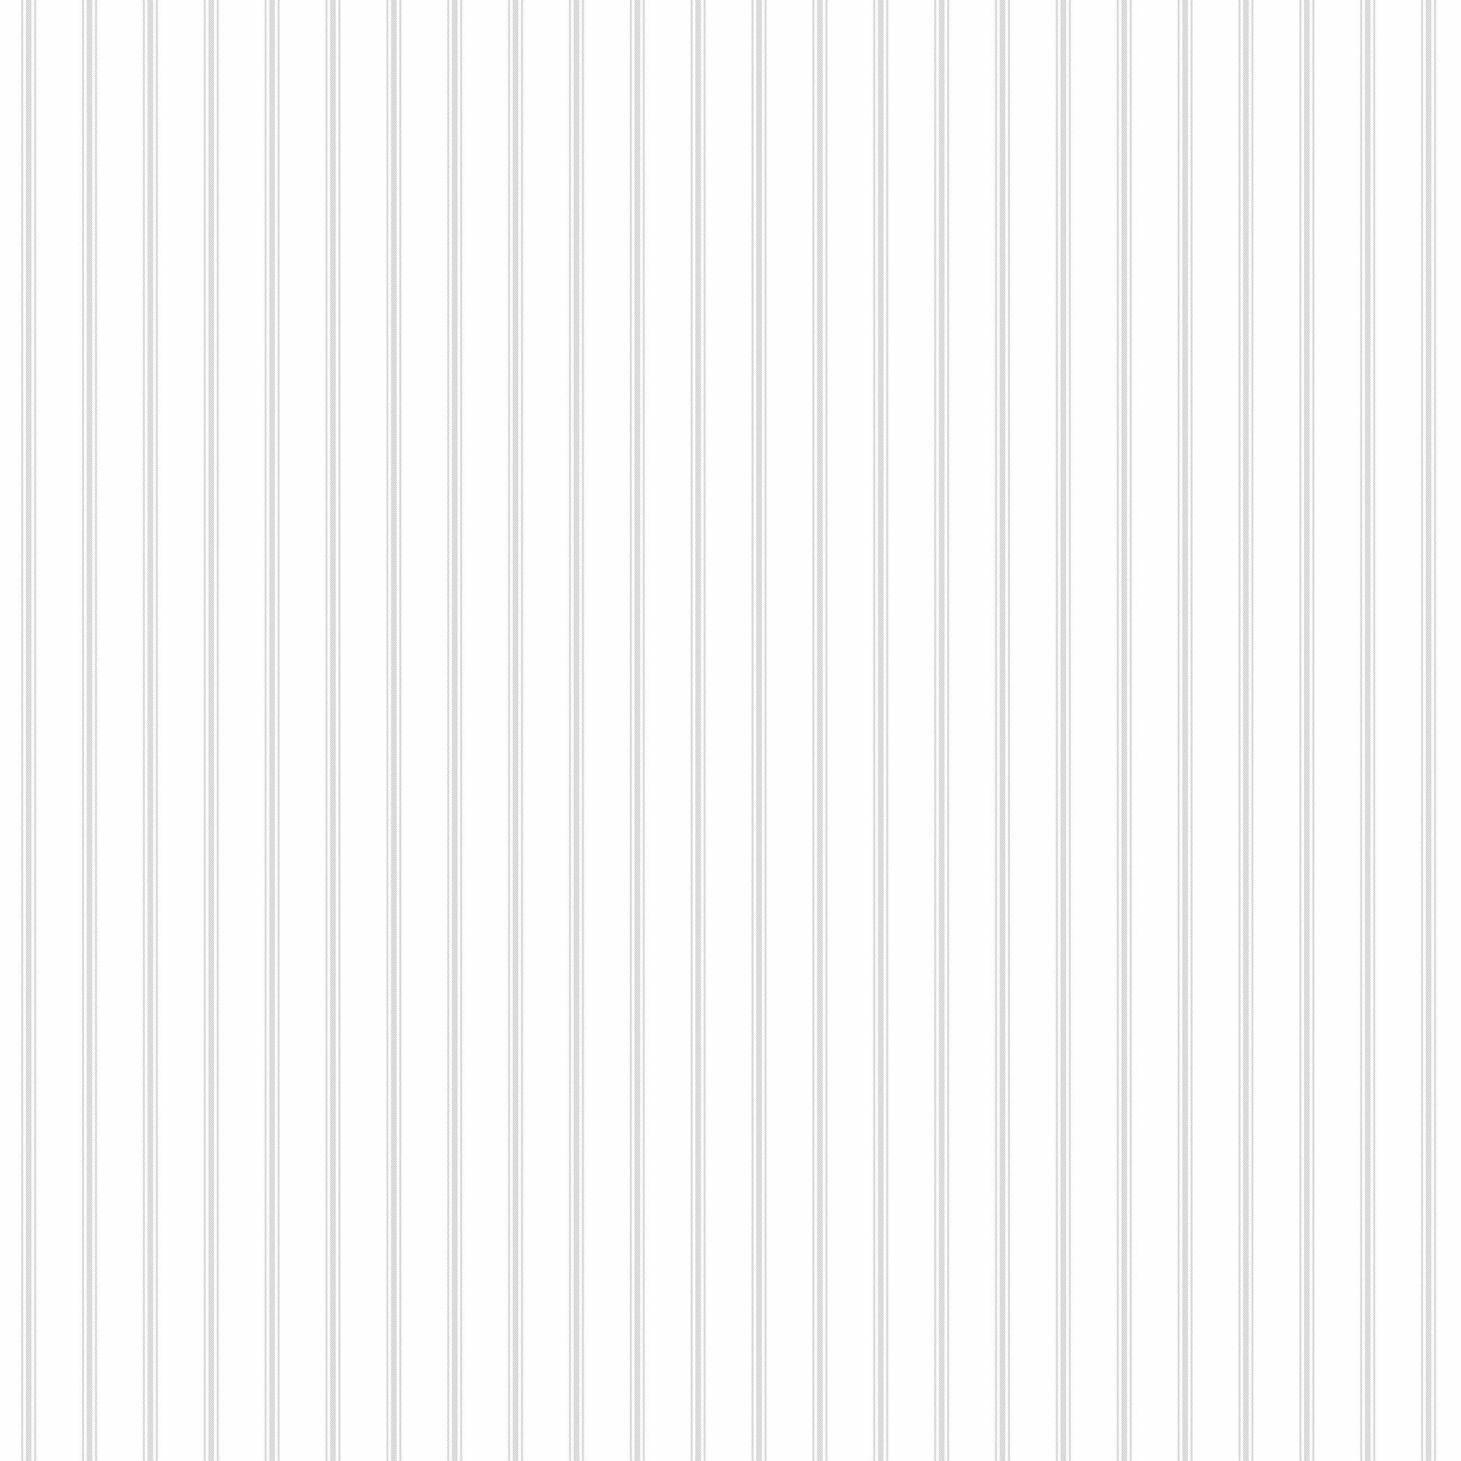 Essener Tapete Simply Stripes 3 ST36908 hellgrey Streifen gestreift Vinyltapete